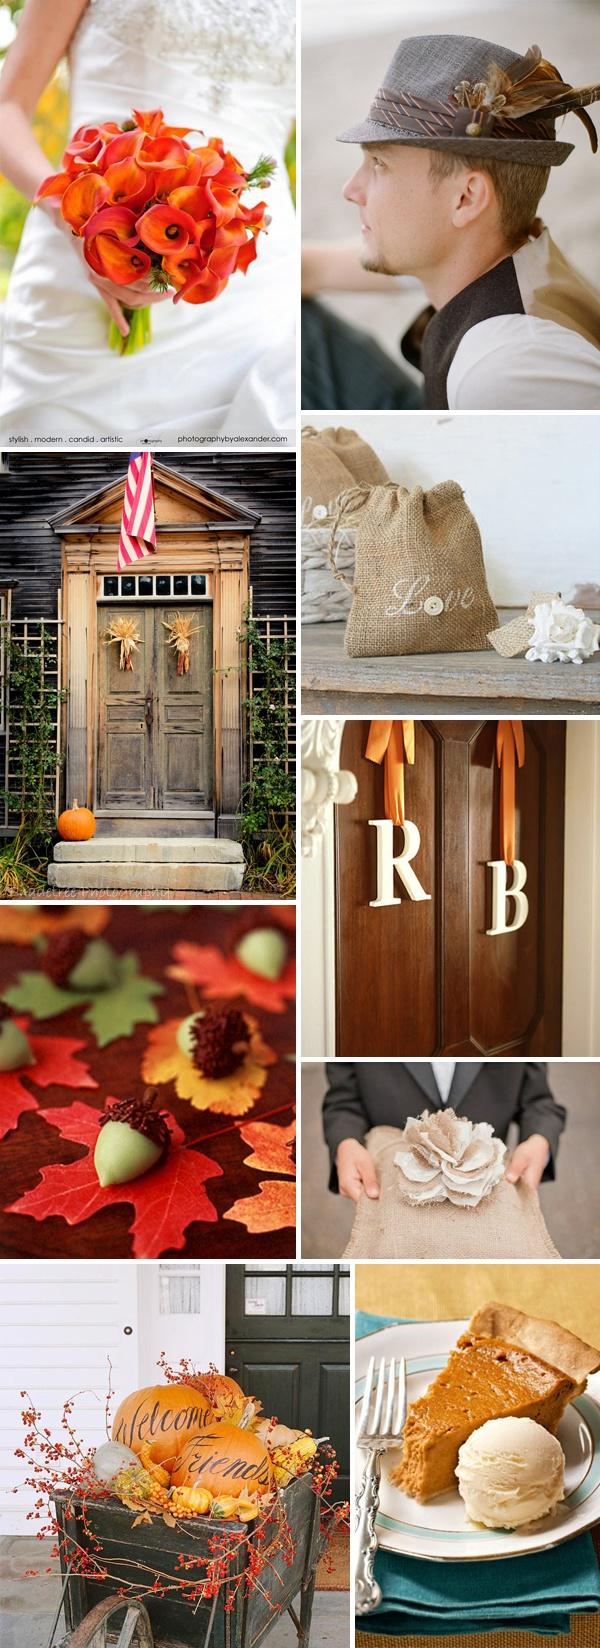 best Wedding Season Fall images on Pinterest  Wedding ideas